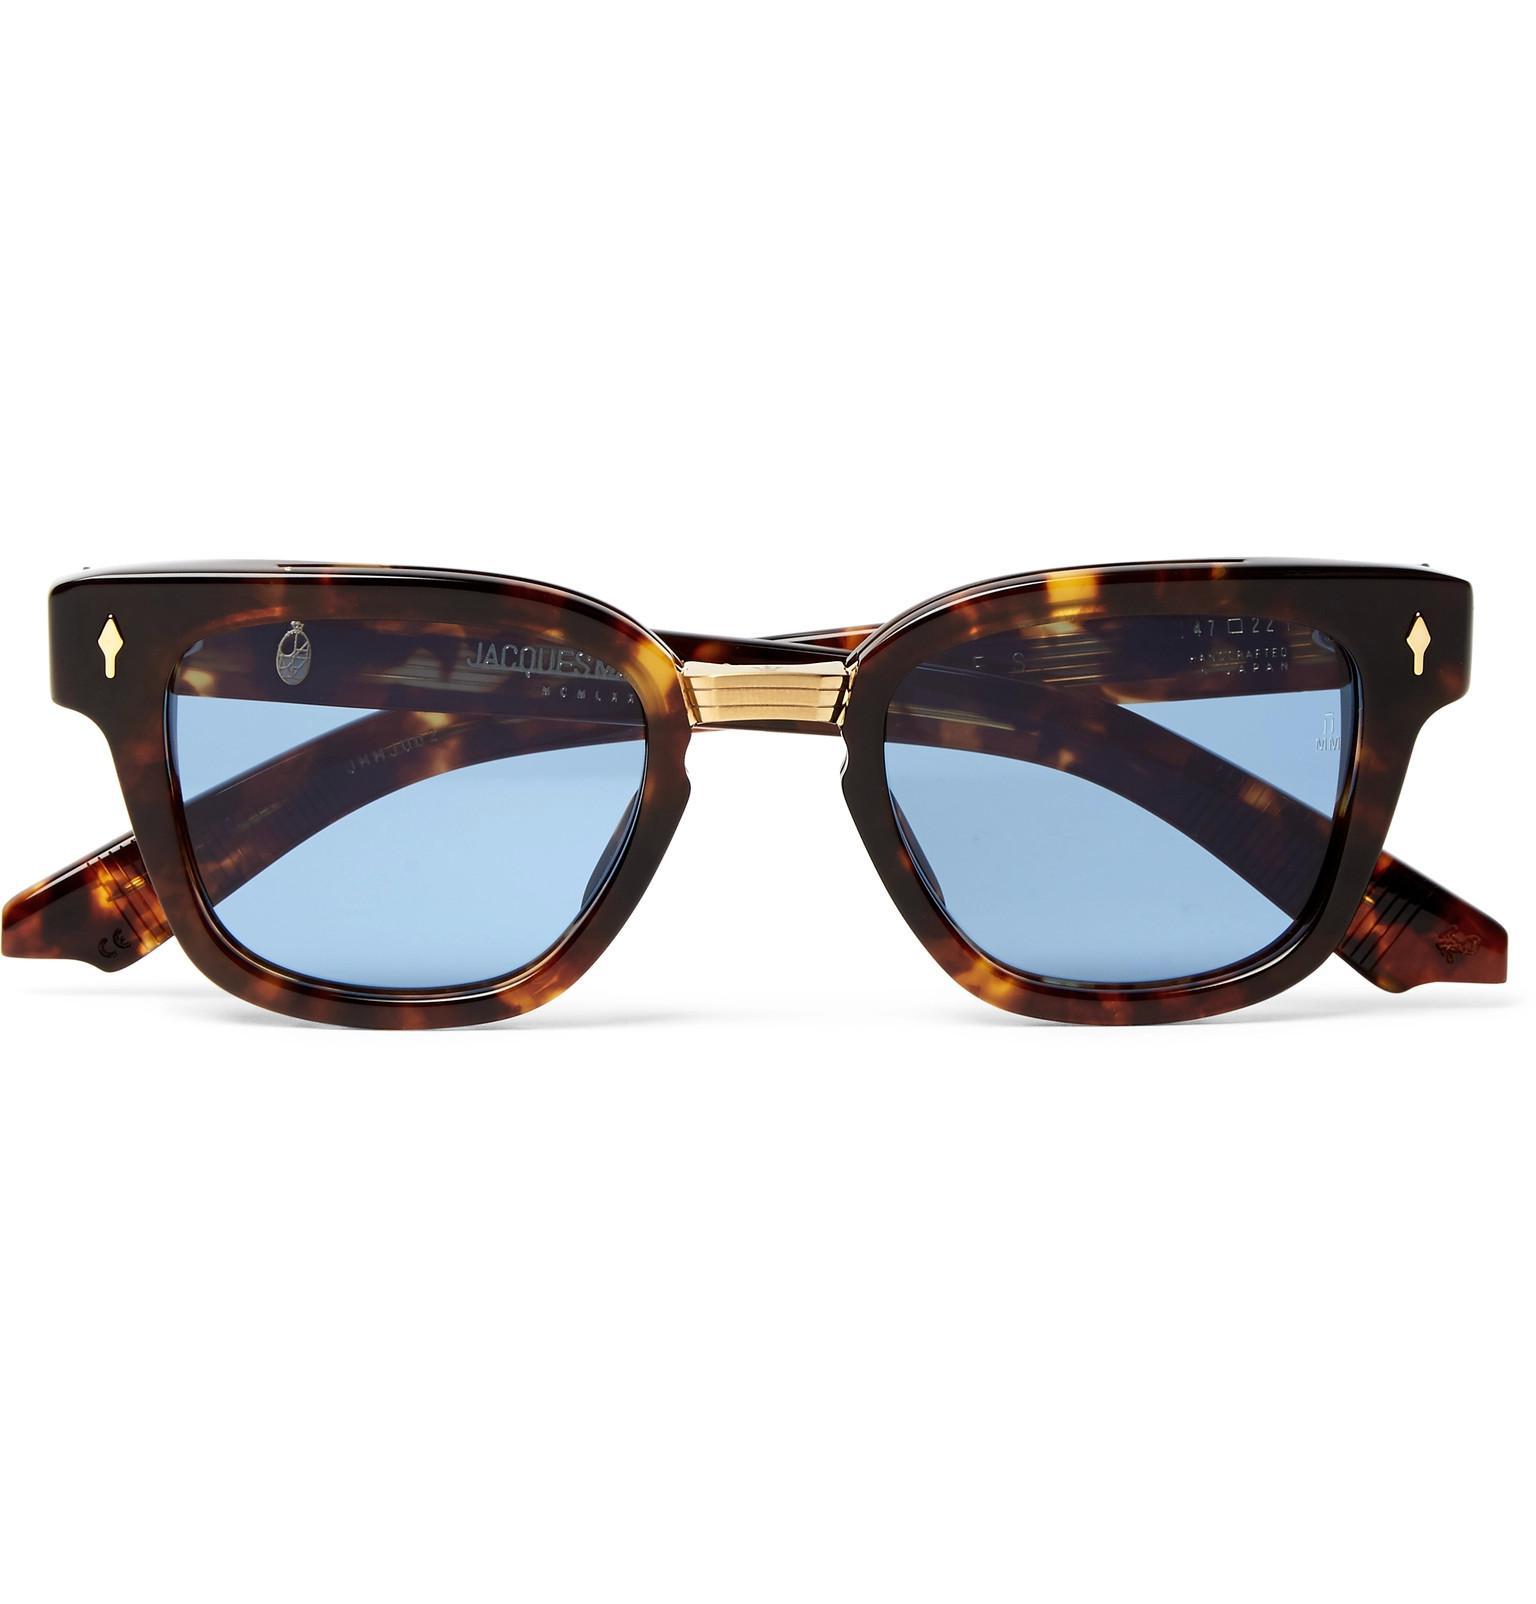 JACQUES MARIE MAGE Torino Square-frame Tortoiseshell Acetate Sunglasses - Tortoiseshell uVyHBxDta8